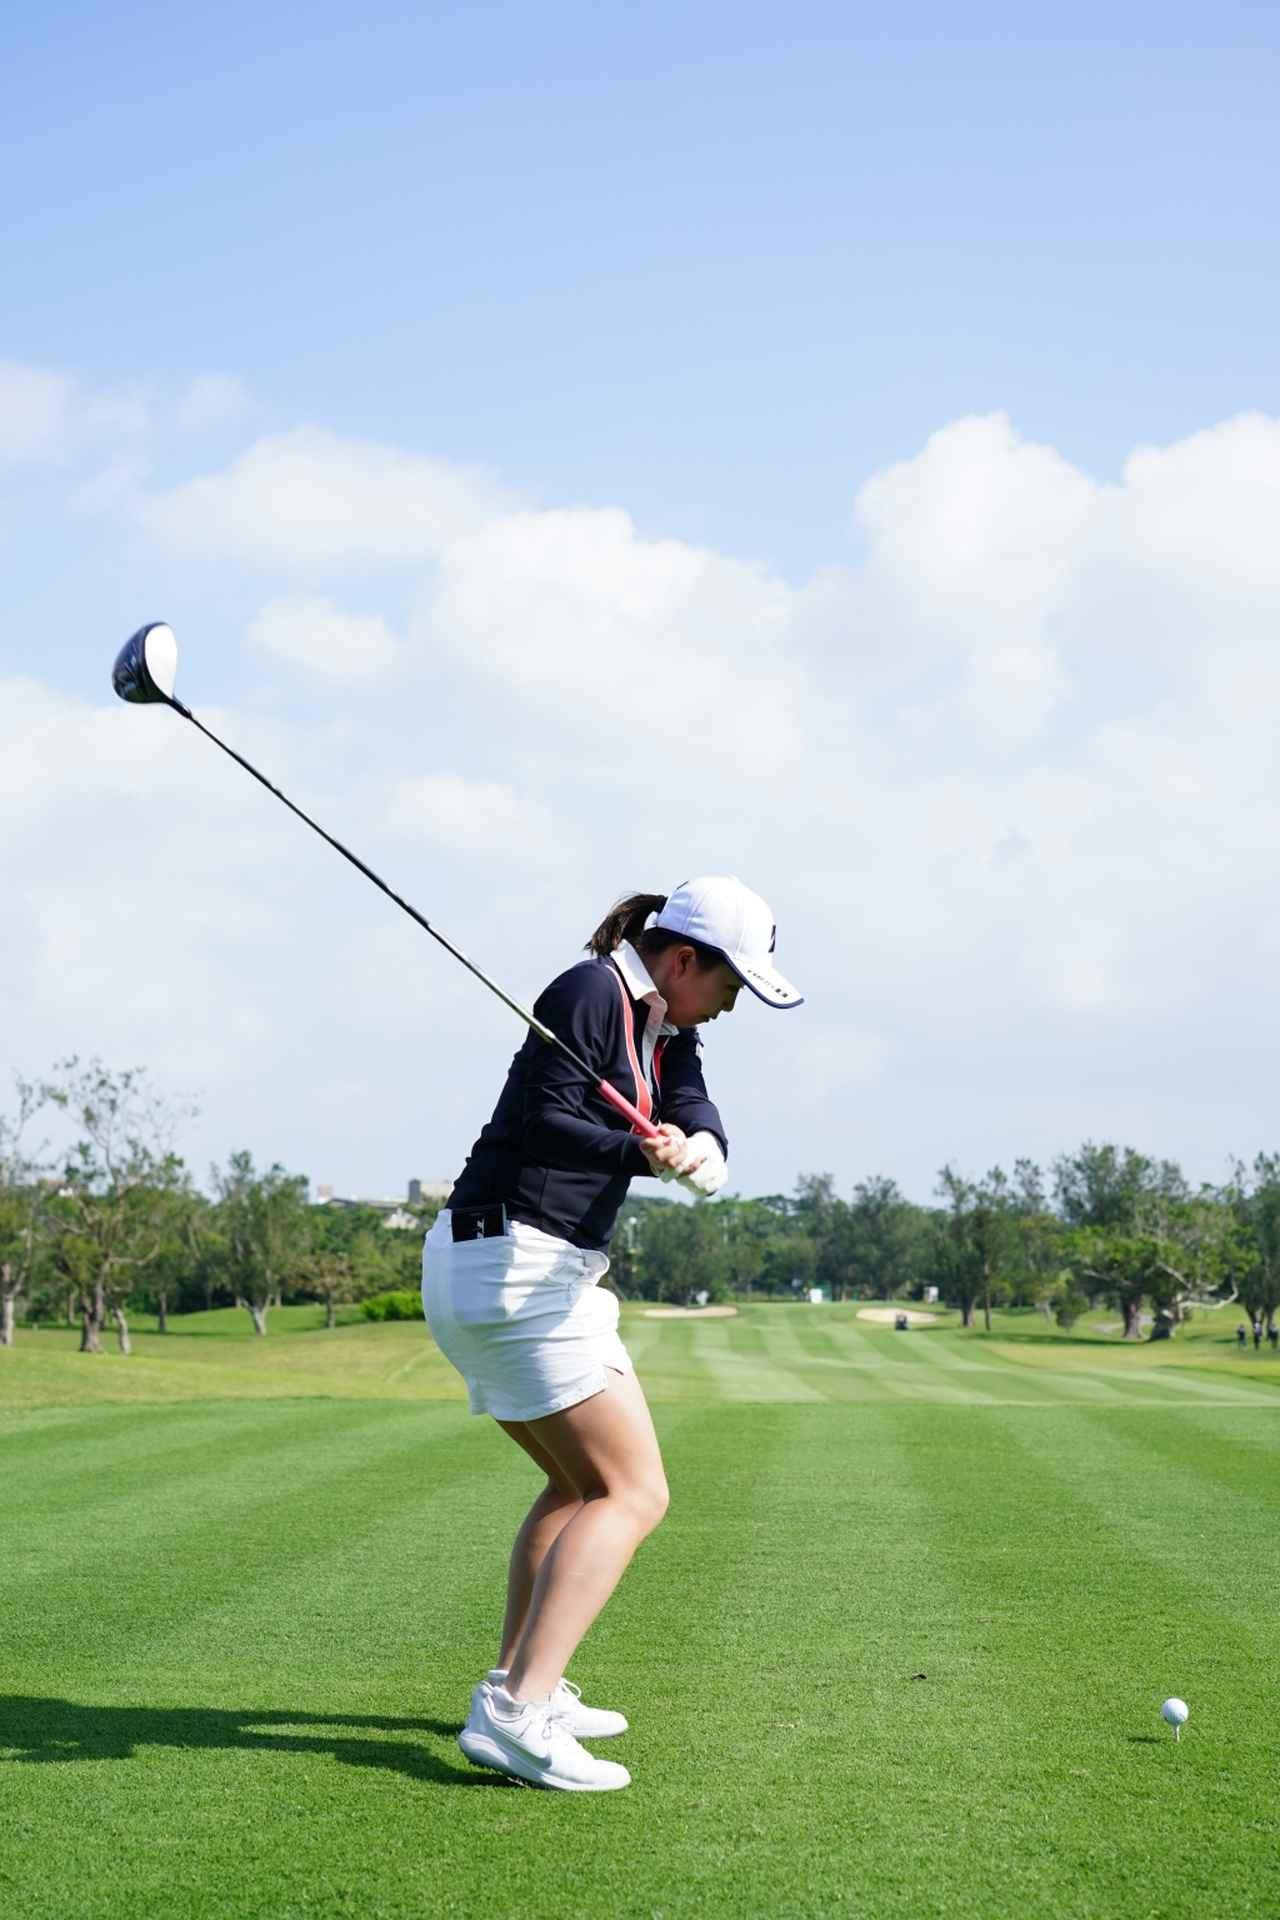 Images : 12番目の画像 - 丹萌乃のドライバー連続写真 - みんなのゴルフダイジェスト